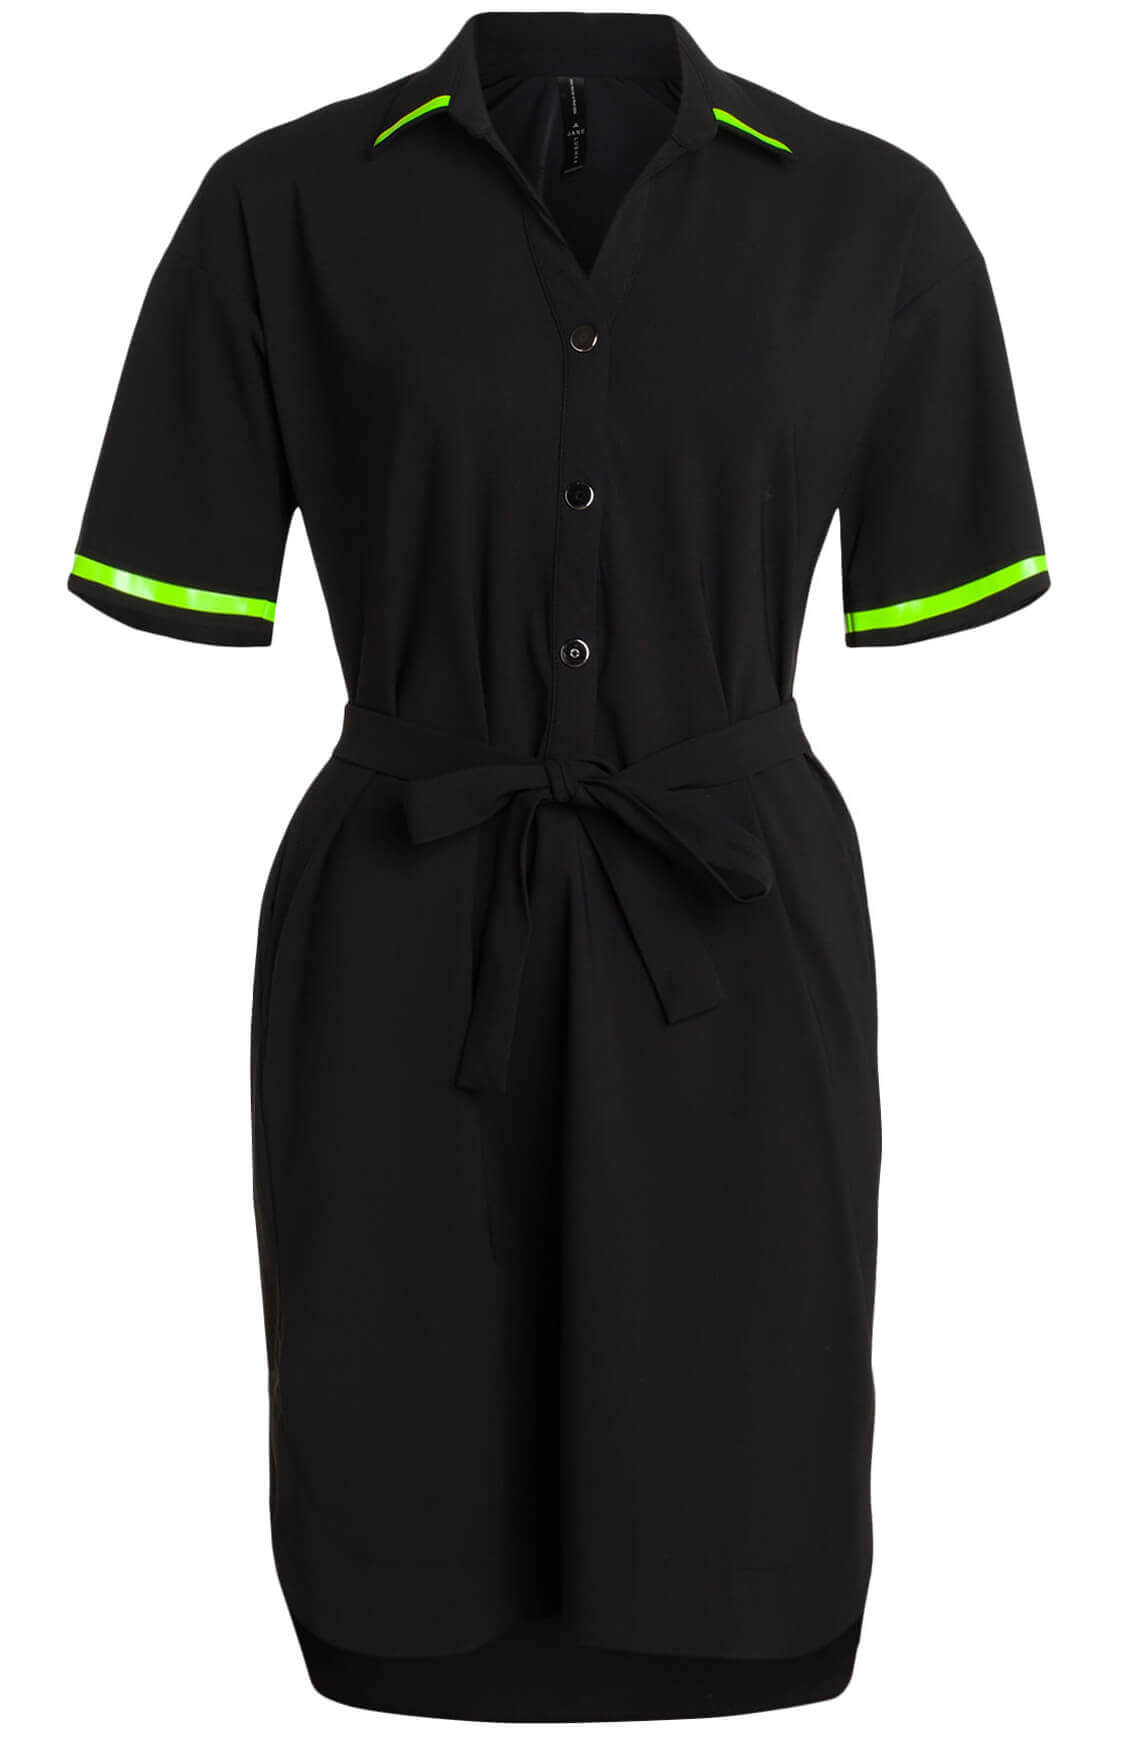 Jane Lushka Dames Nelly jurk zwart